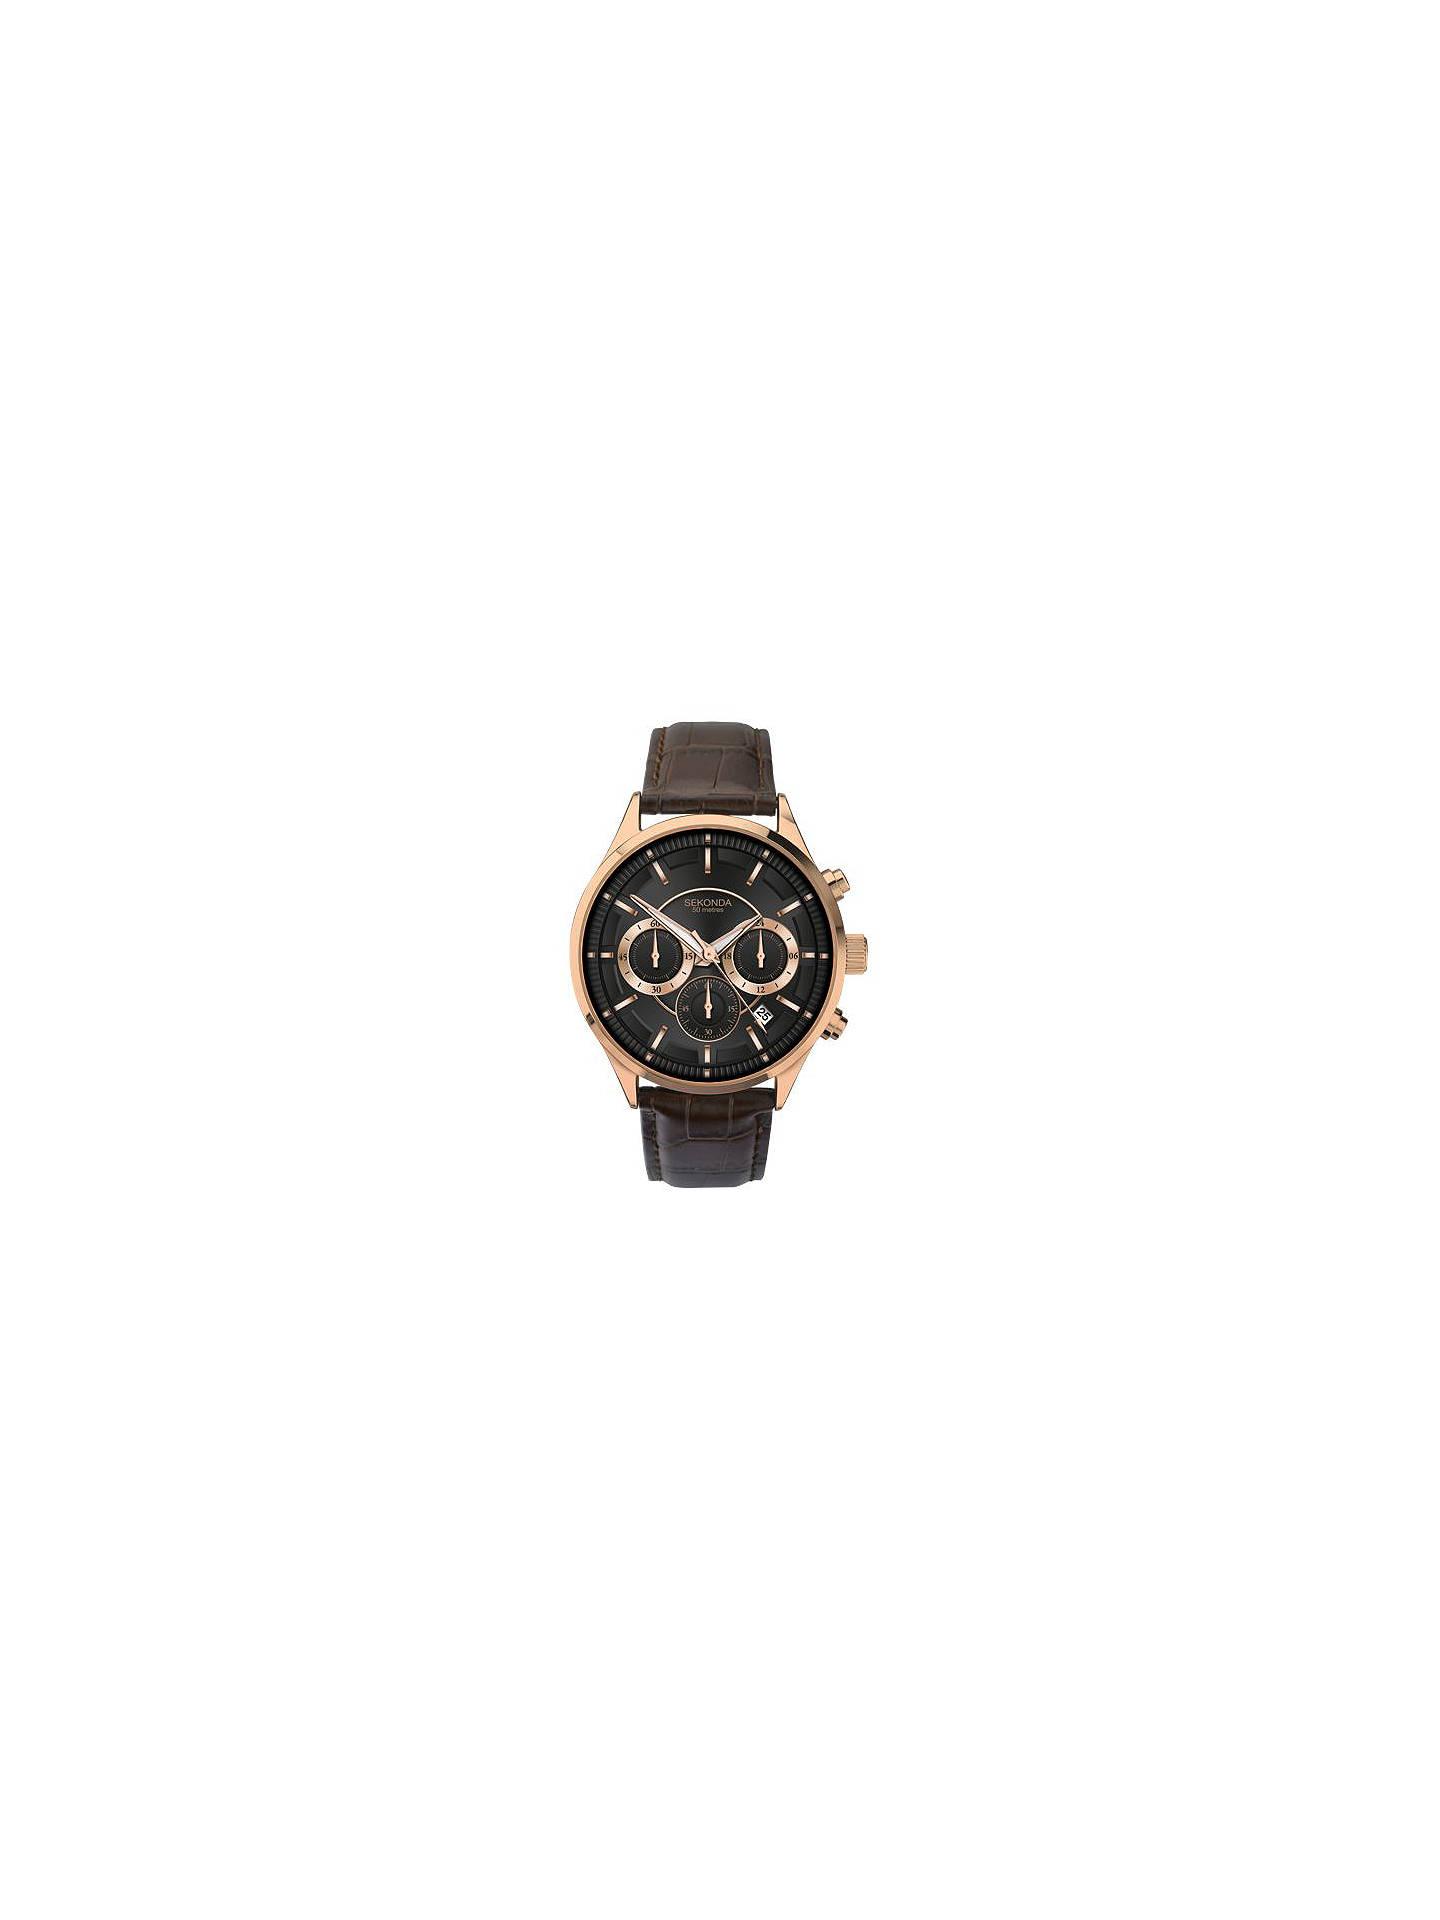 d063595d0bc Buy Sekonda 1178.27 Men s Chronograph Date Leather Strap Watch